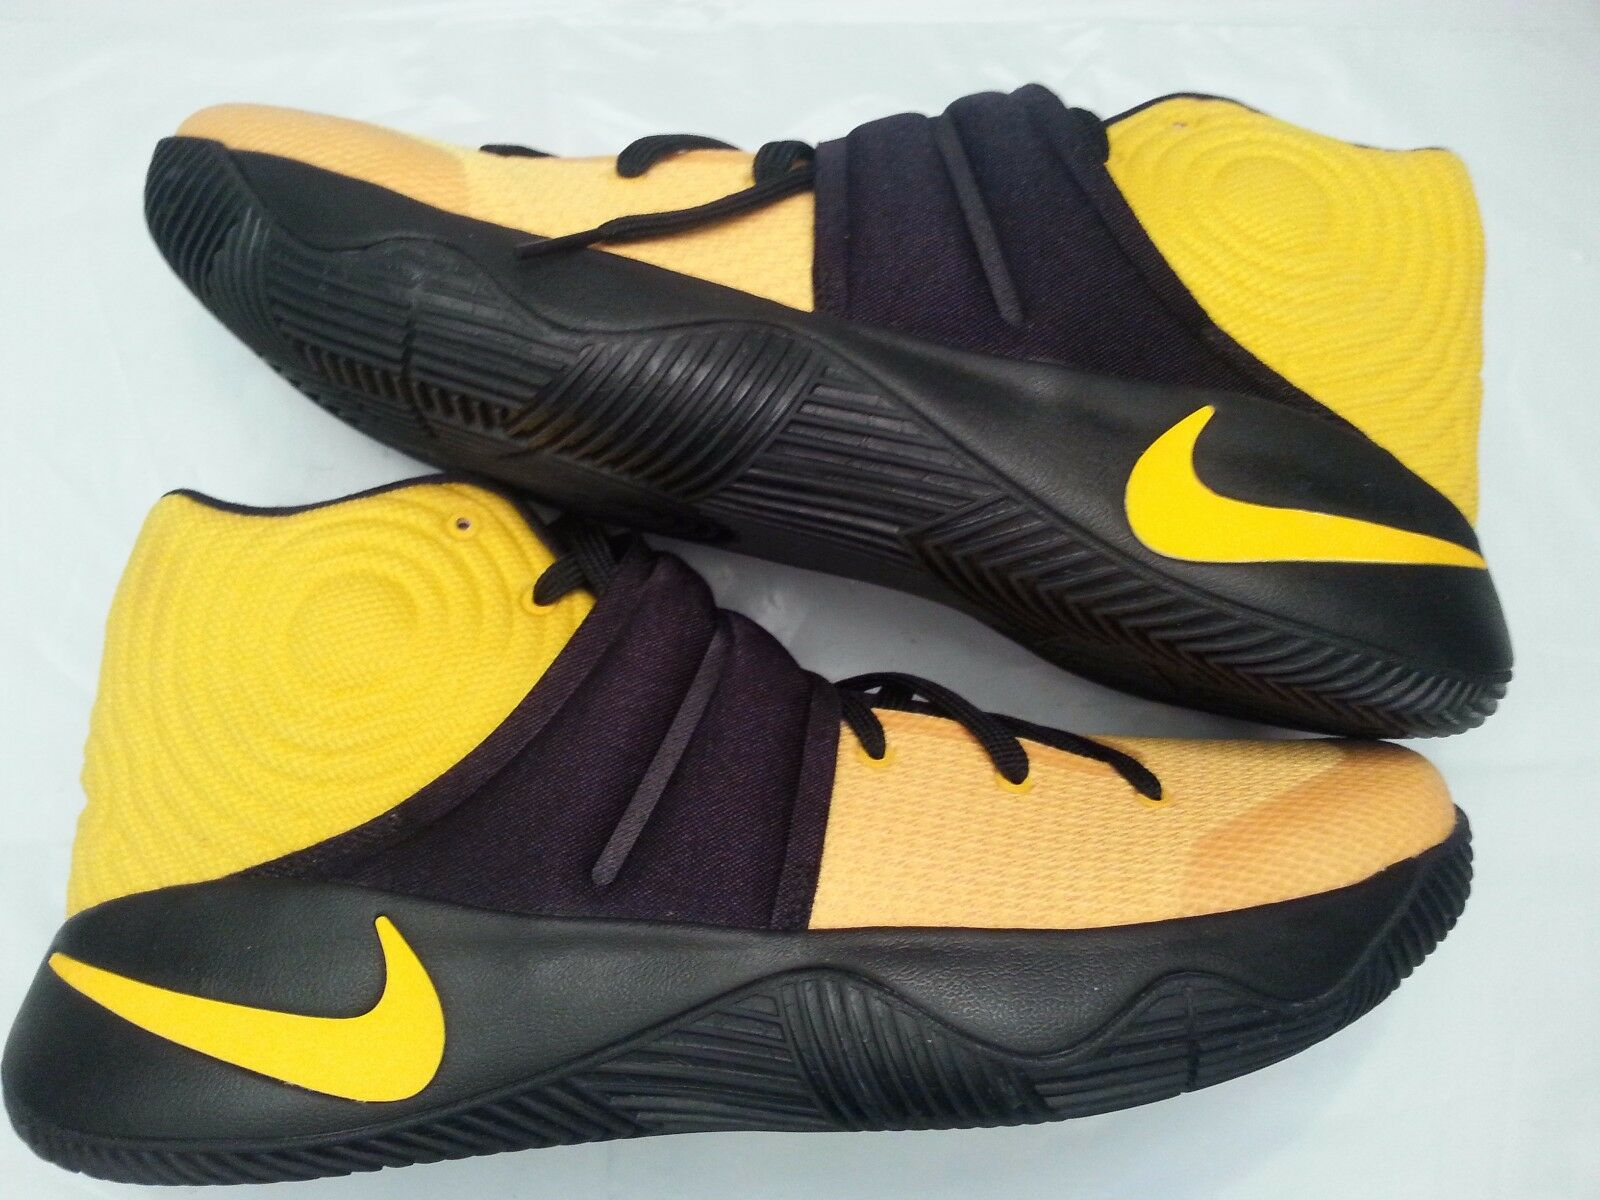 Nike Kyrie 2 ID Black Yellow Size 14. Lebron bhm all star championship mvp